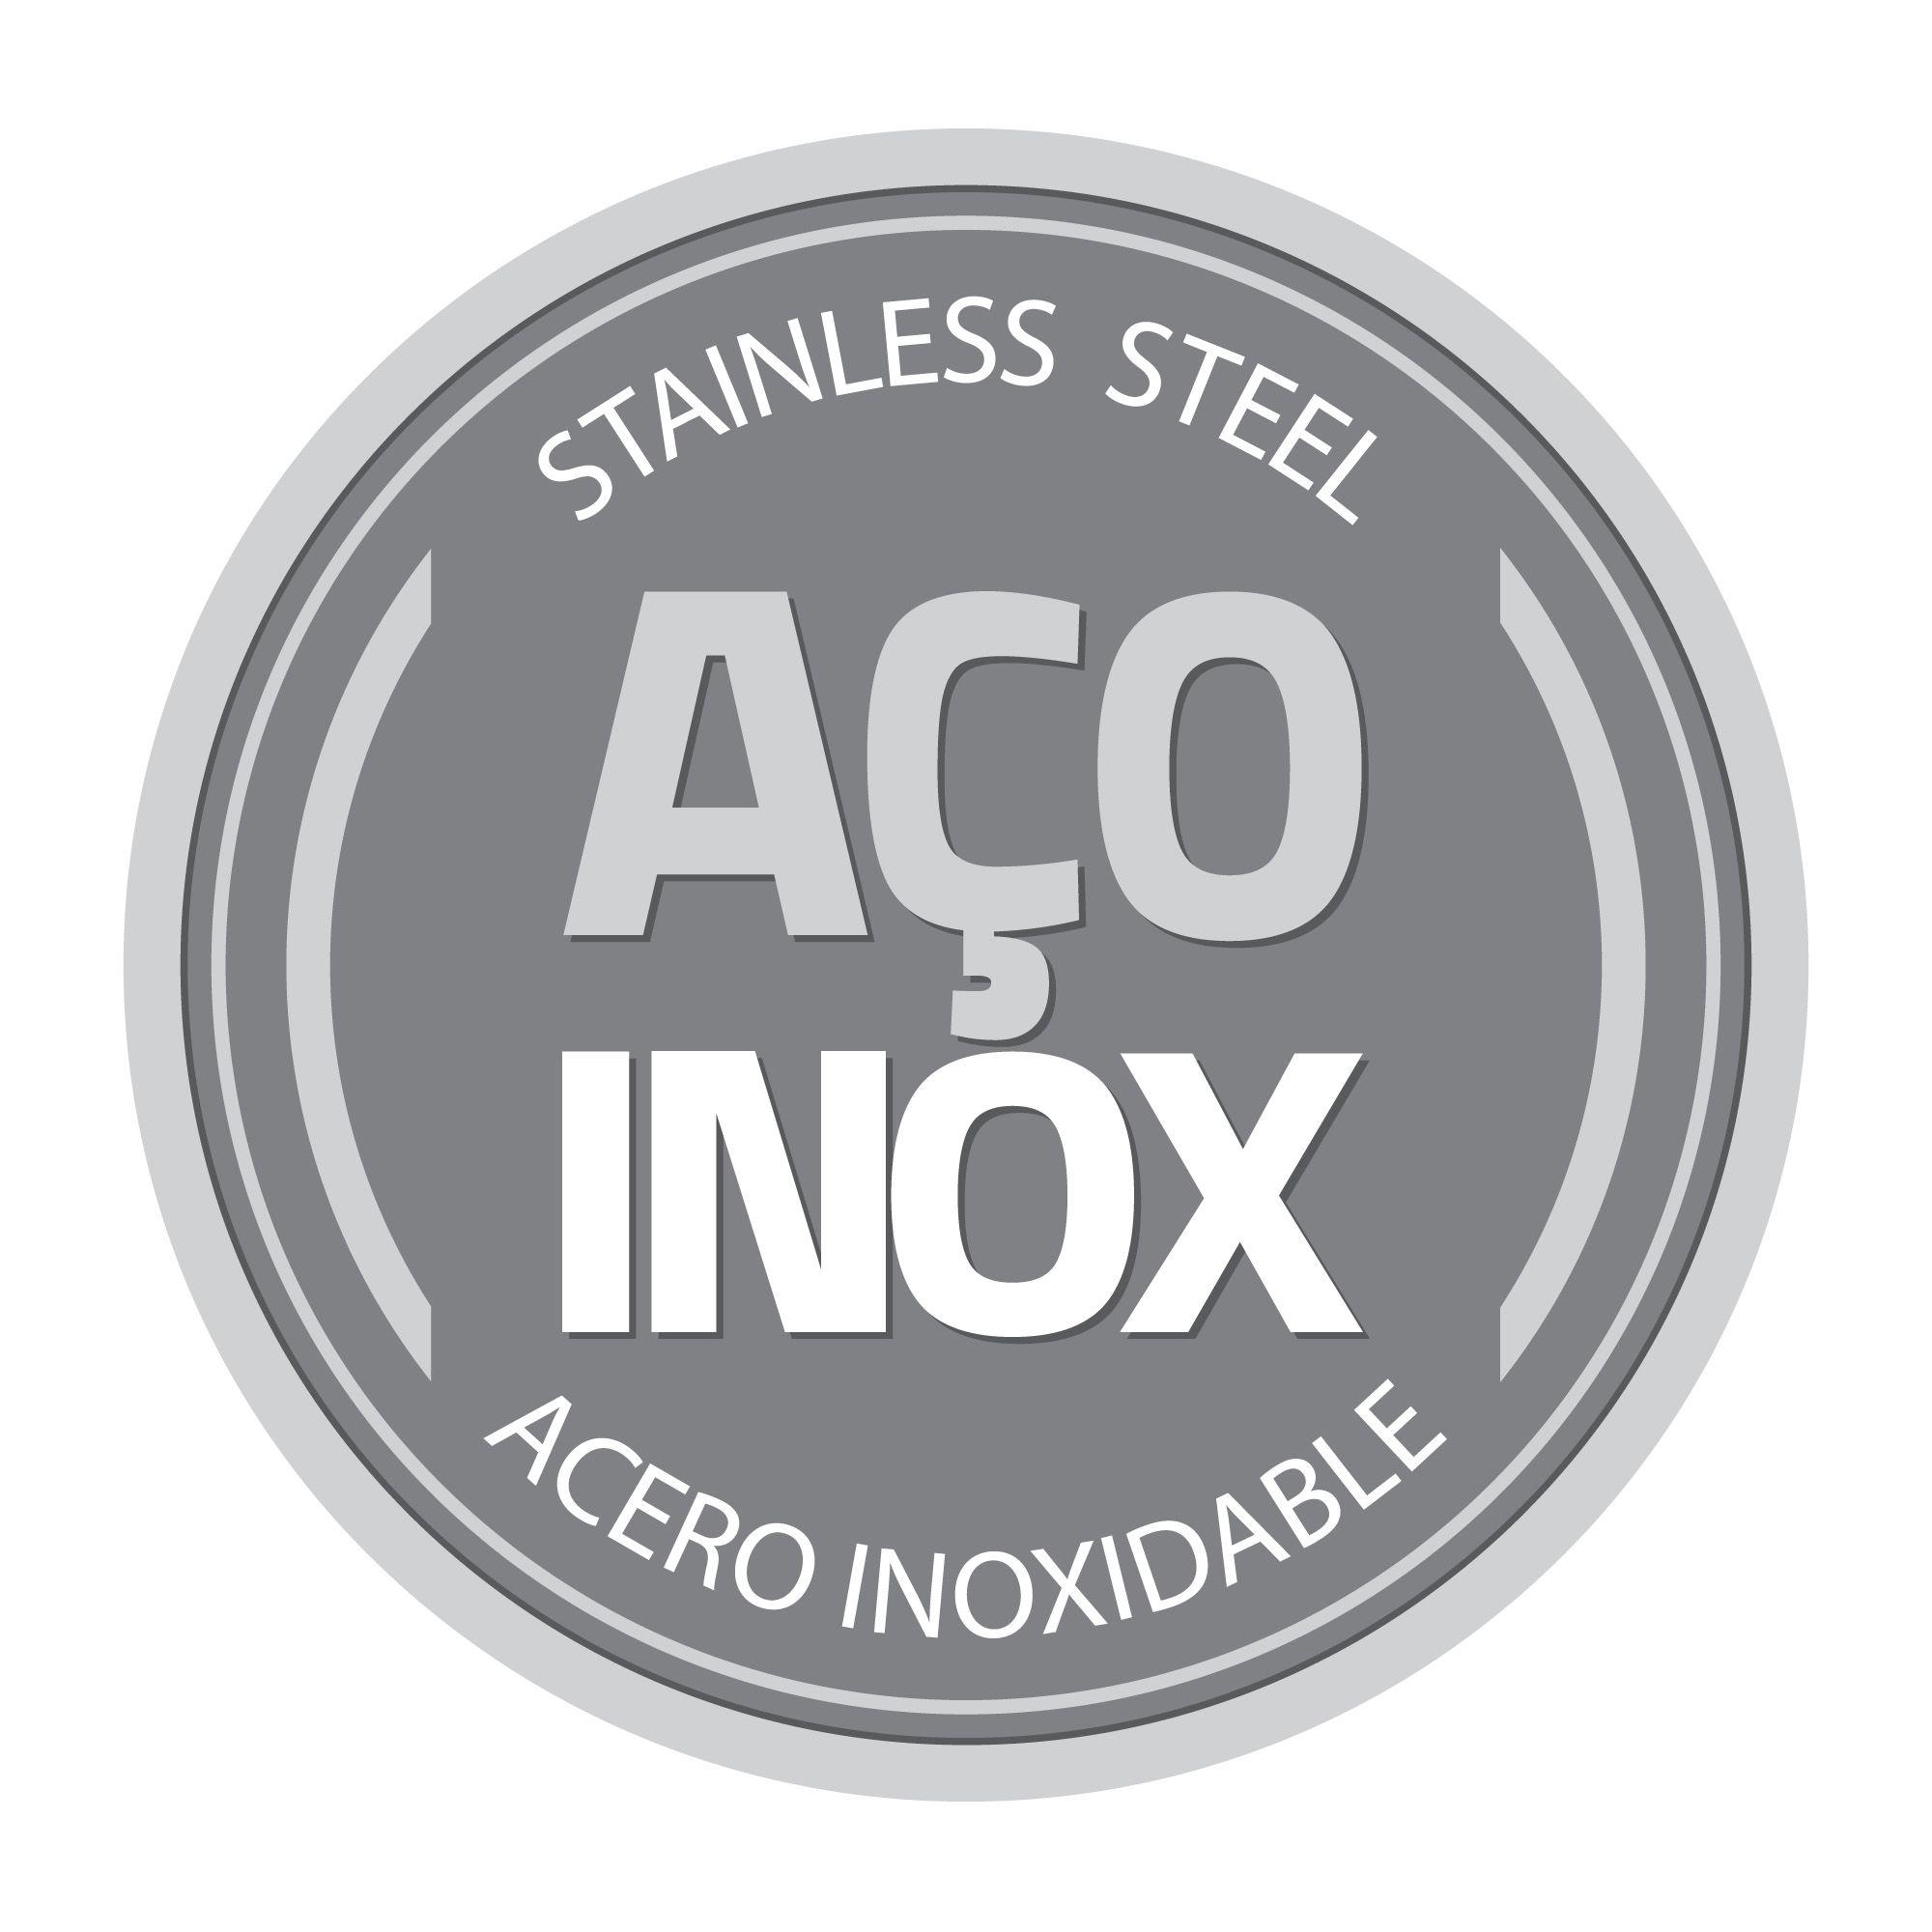 Panela Tramontina Aço Inox 62401/160 | Lojas Estrela